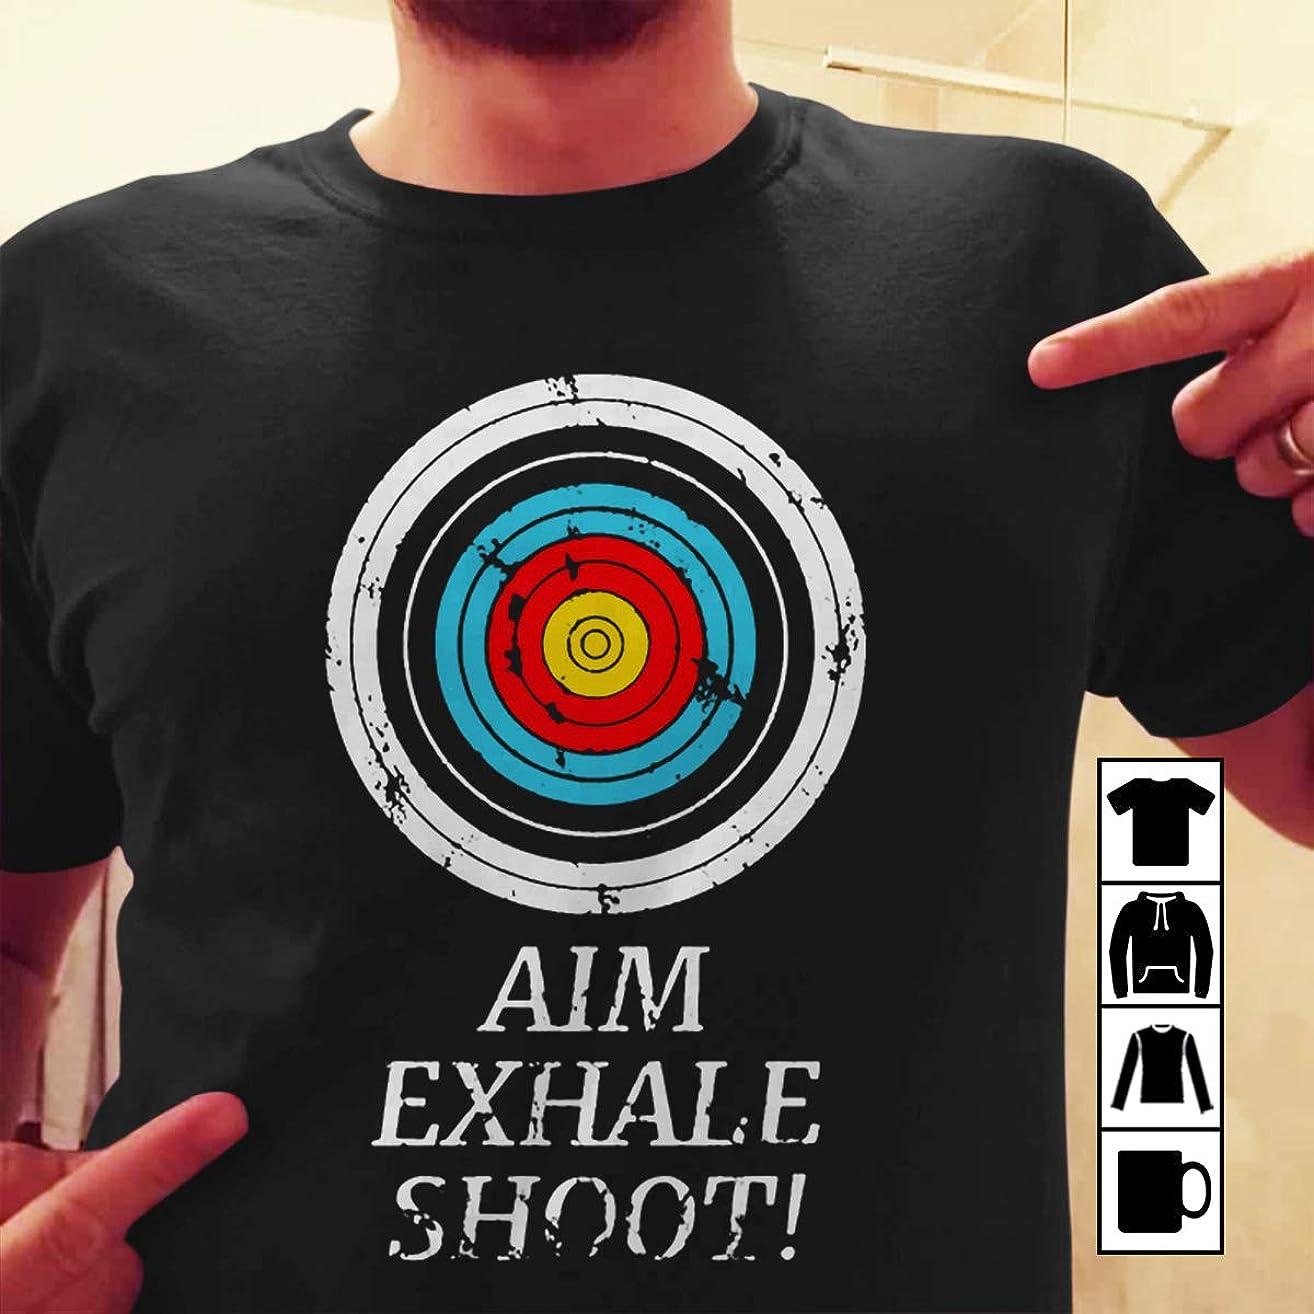 Bowman Archer Archery Target aim exhale shoot T Shirt Long Sleeve Sweatshirt Hoodie Youth